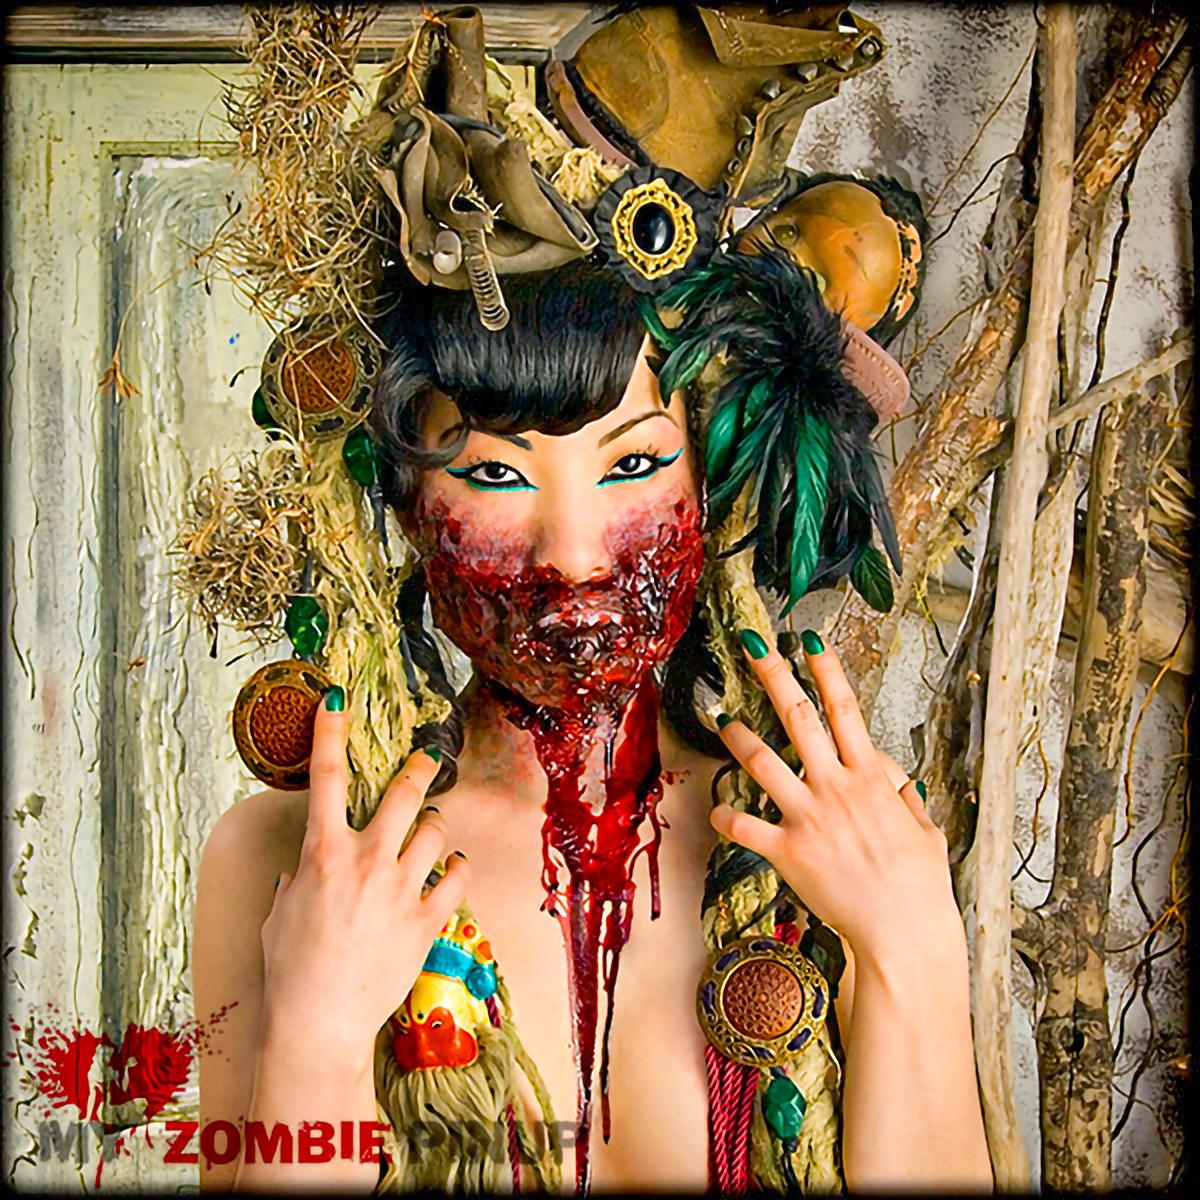 My Zombie Pinup Calendar 06/12